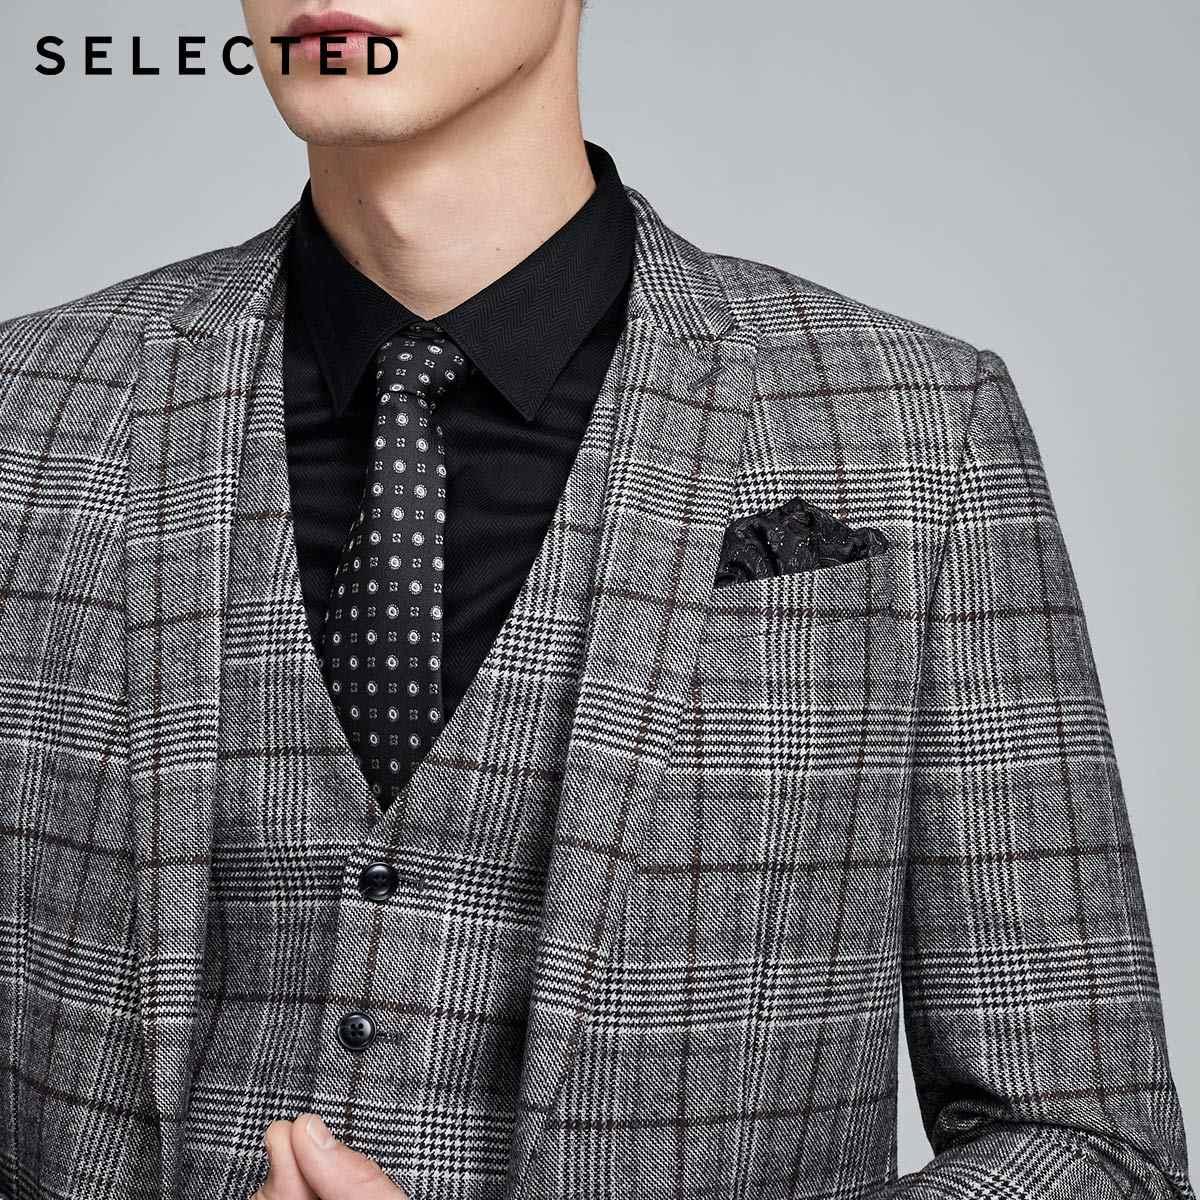 SELECTED 남성 모직 체크 무늬 슬림 피트 모직 비즈니스 캐주얼 블레이저 S | 419472513